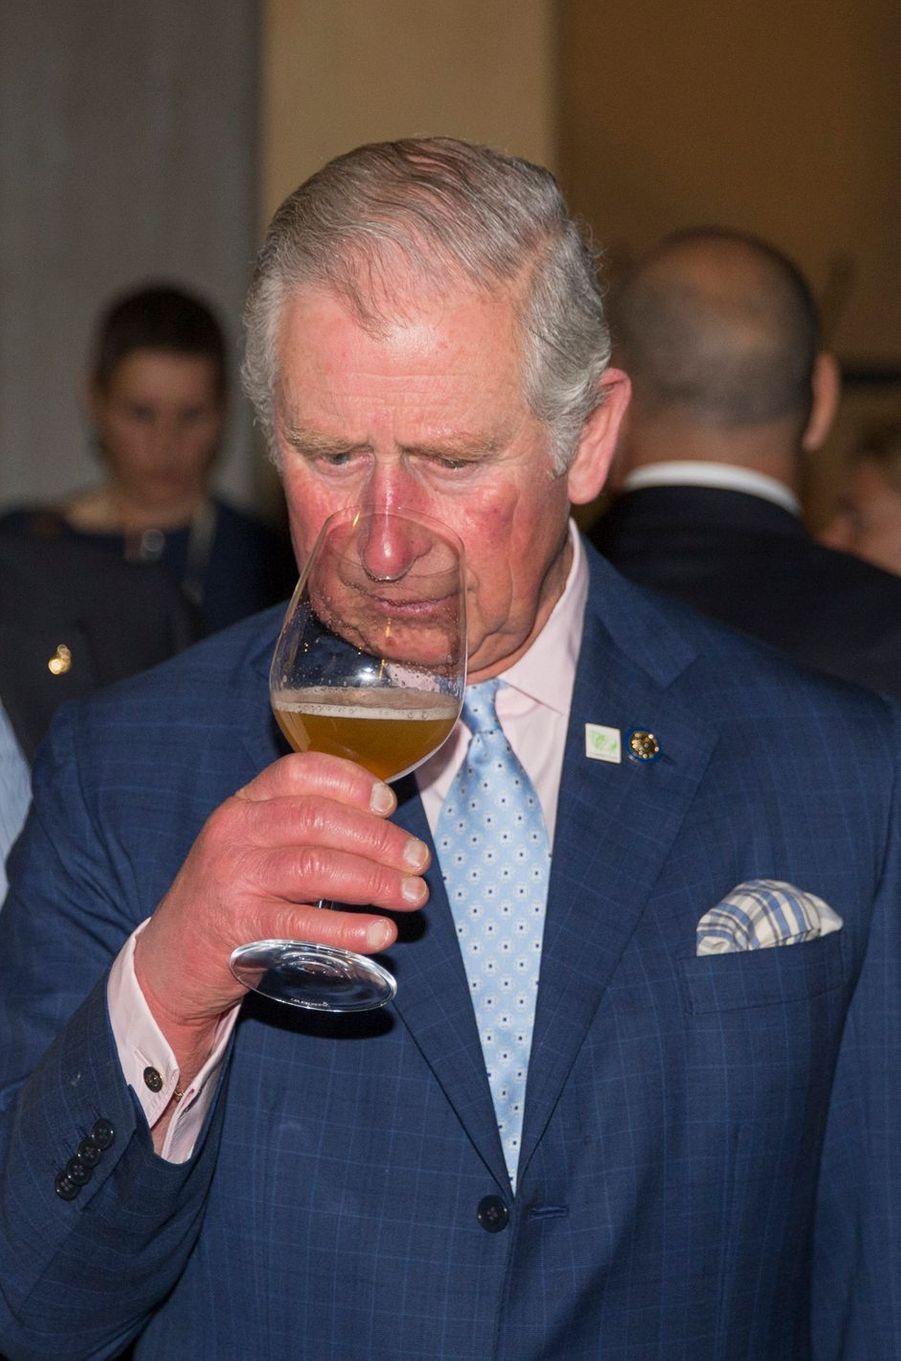 Le prince Charles à Florence, le 3 avril 2017